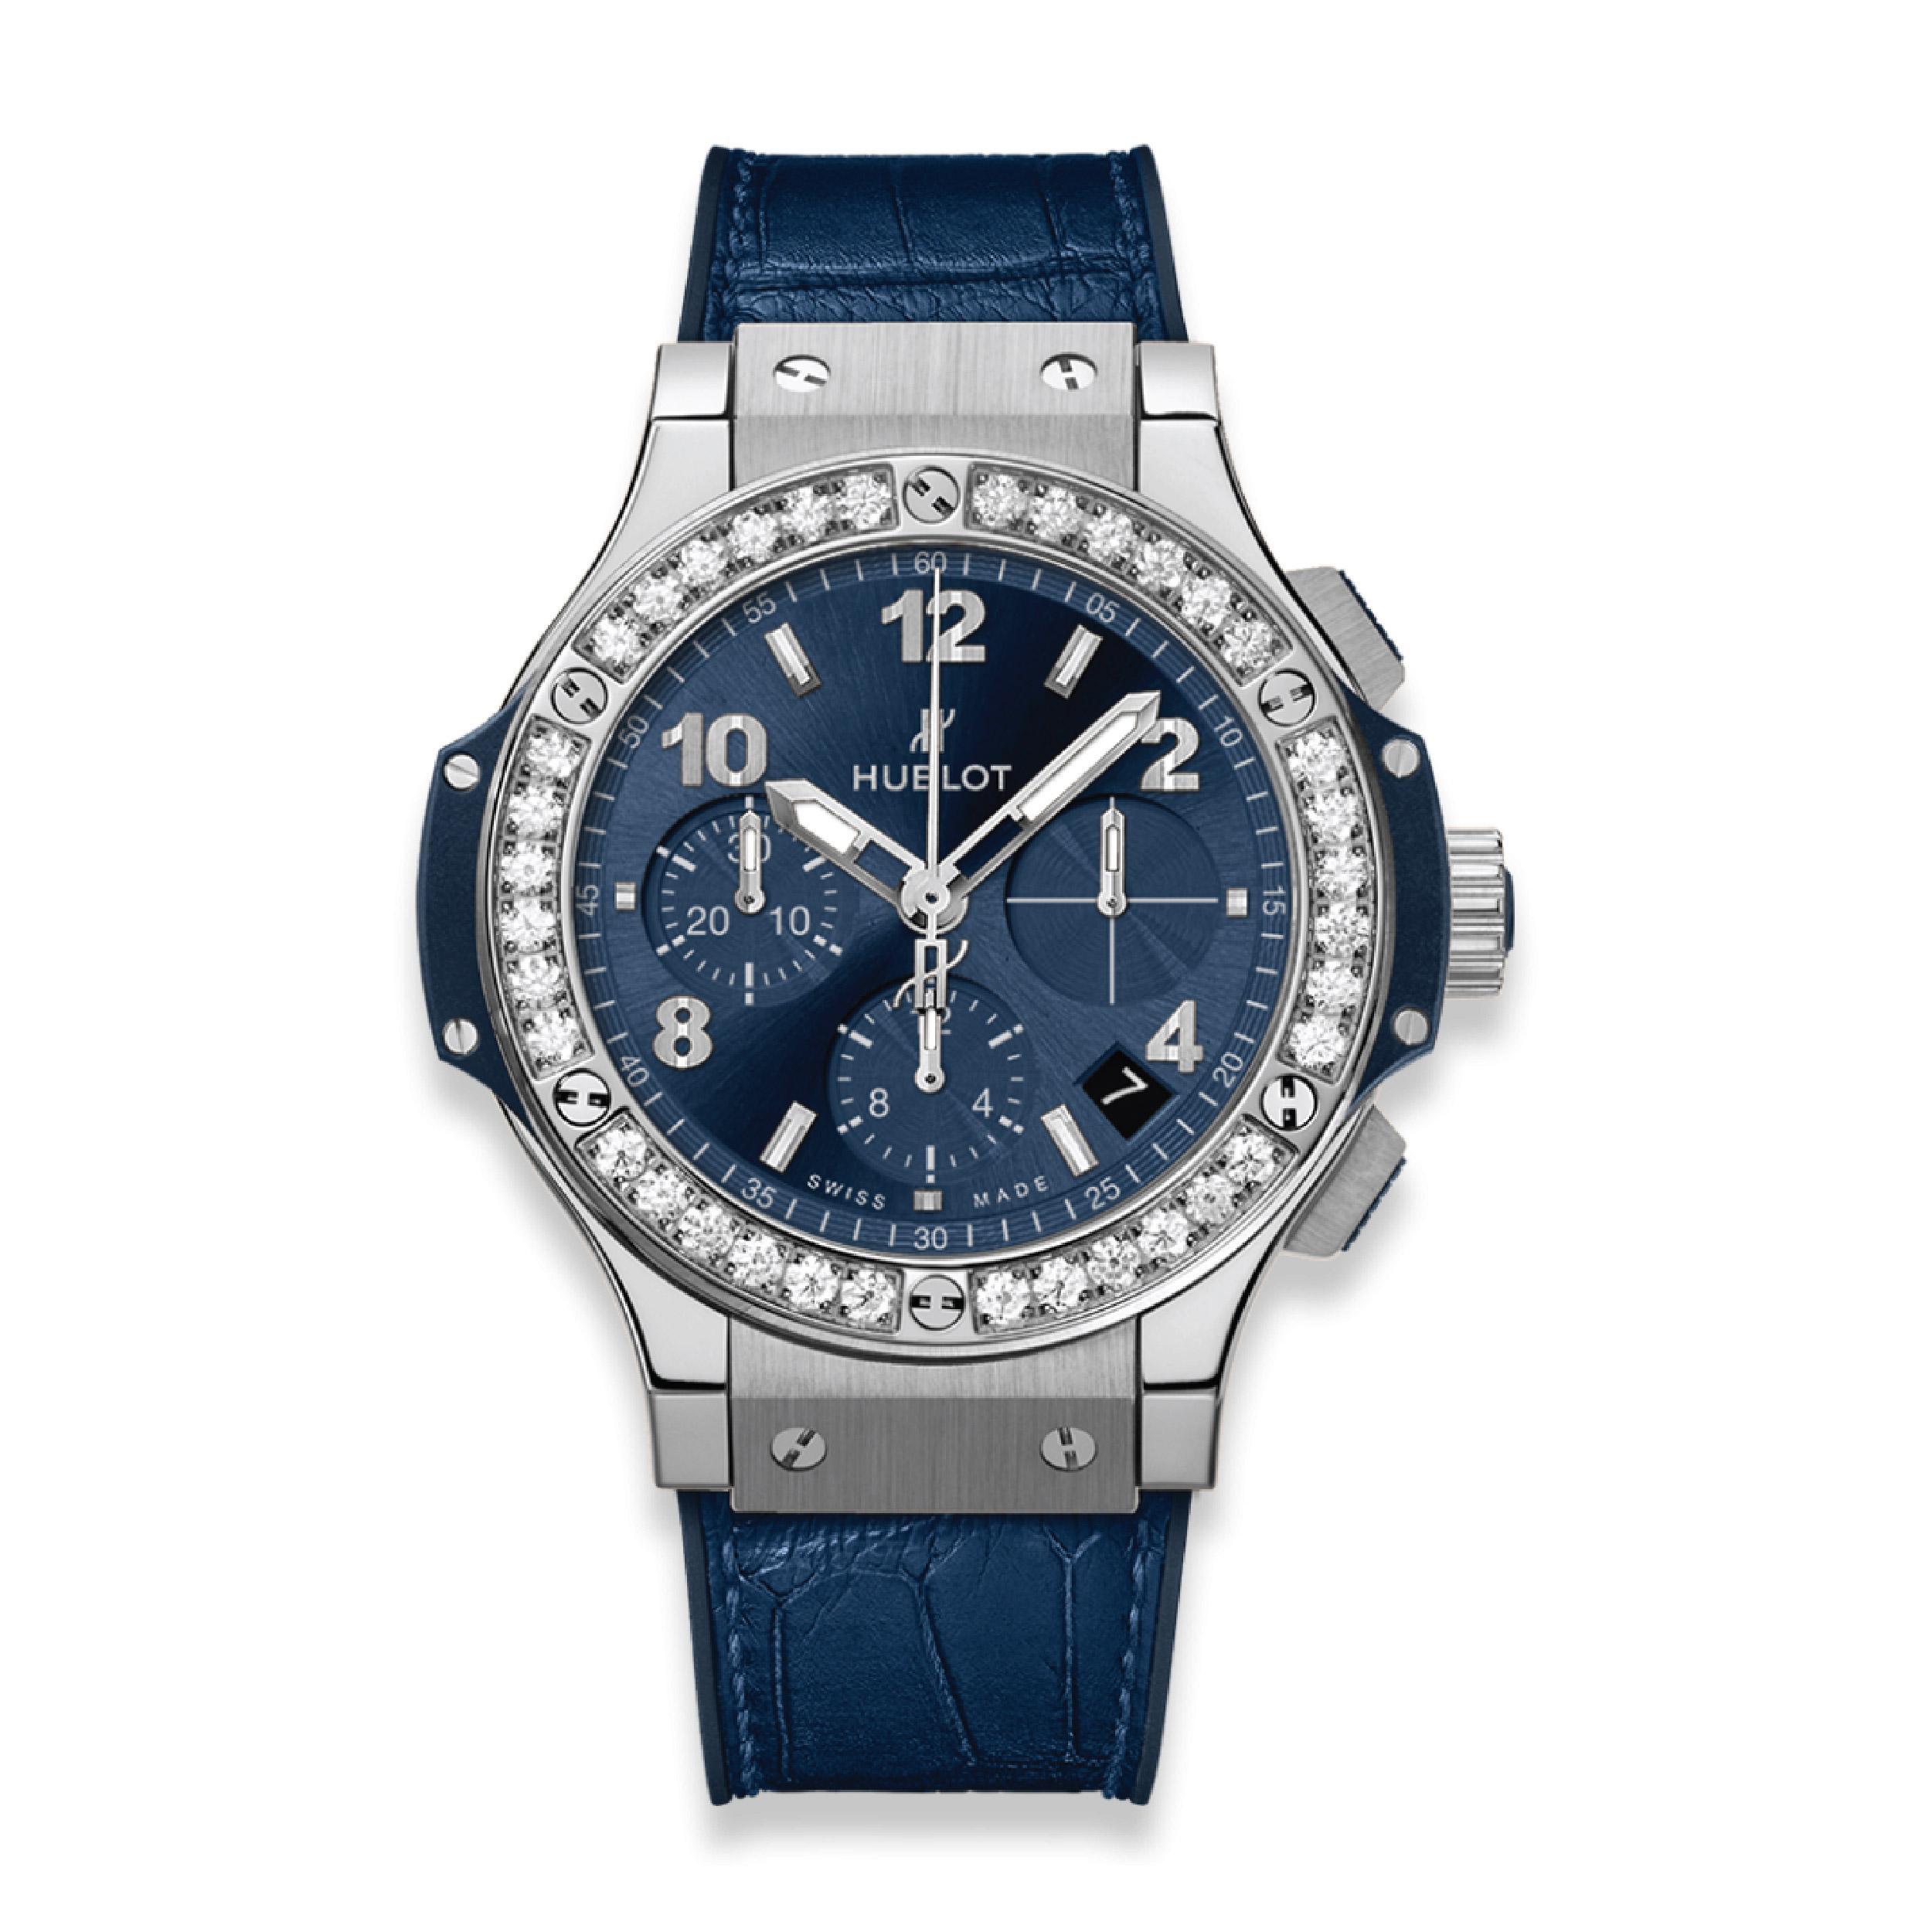 HUBLOT ЧАСЫ BIG BANG STEEL BLUE DIAMONDS 41 mm